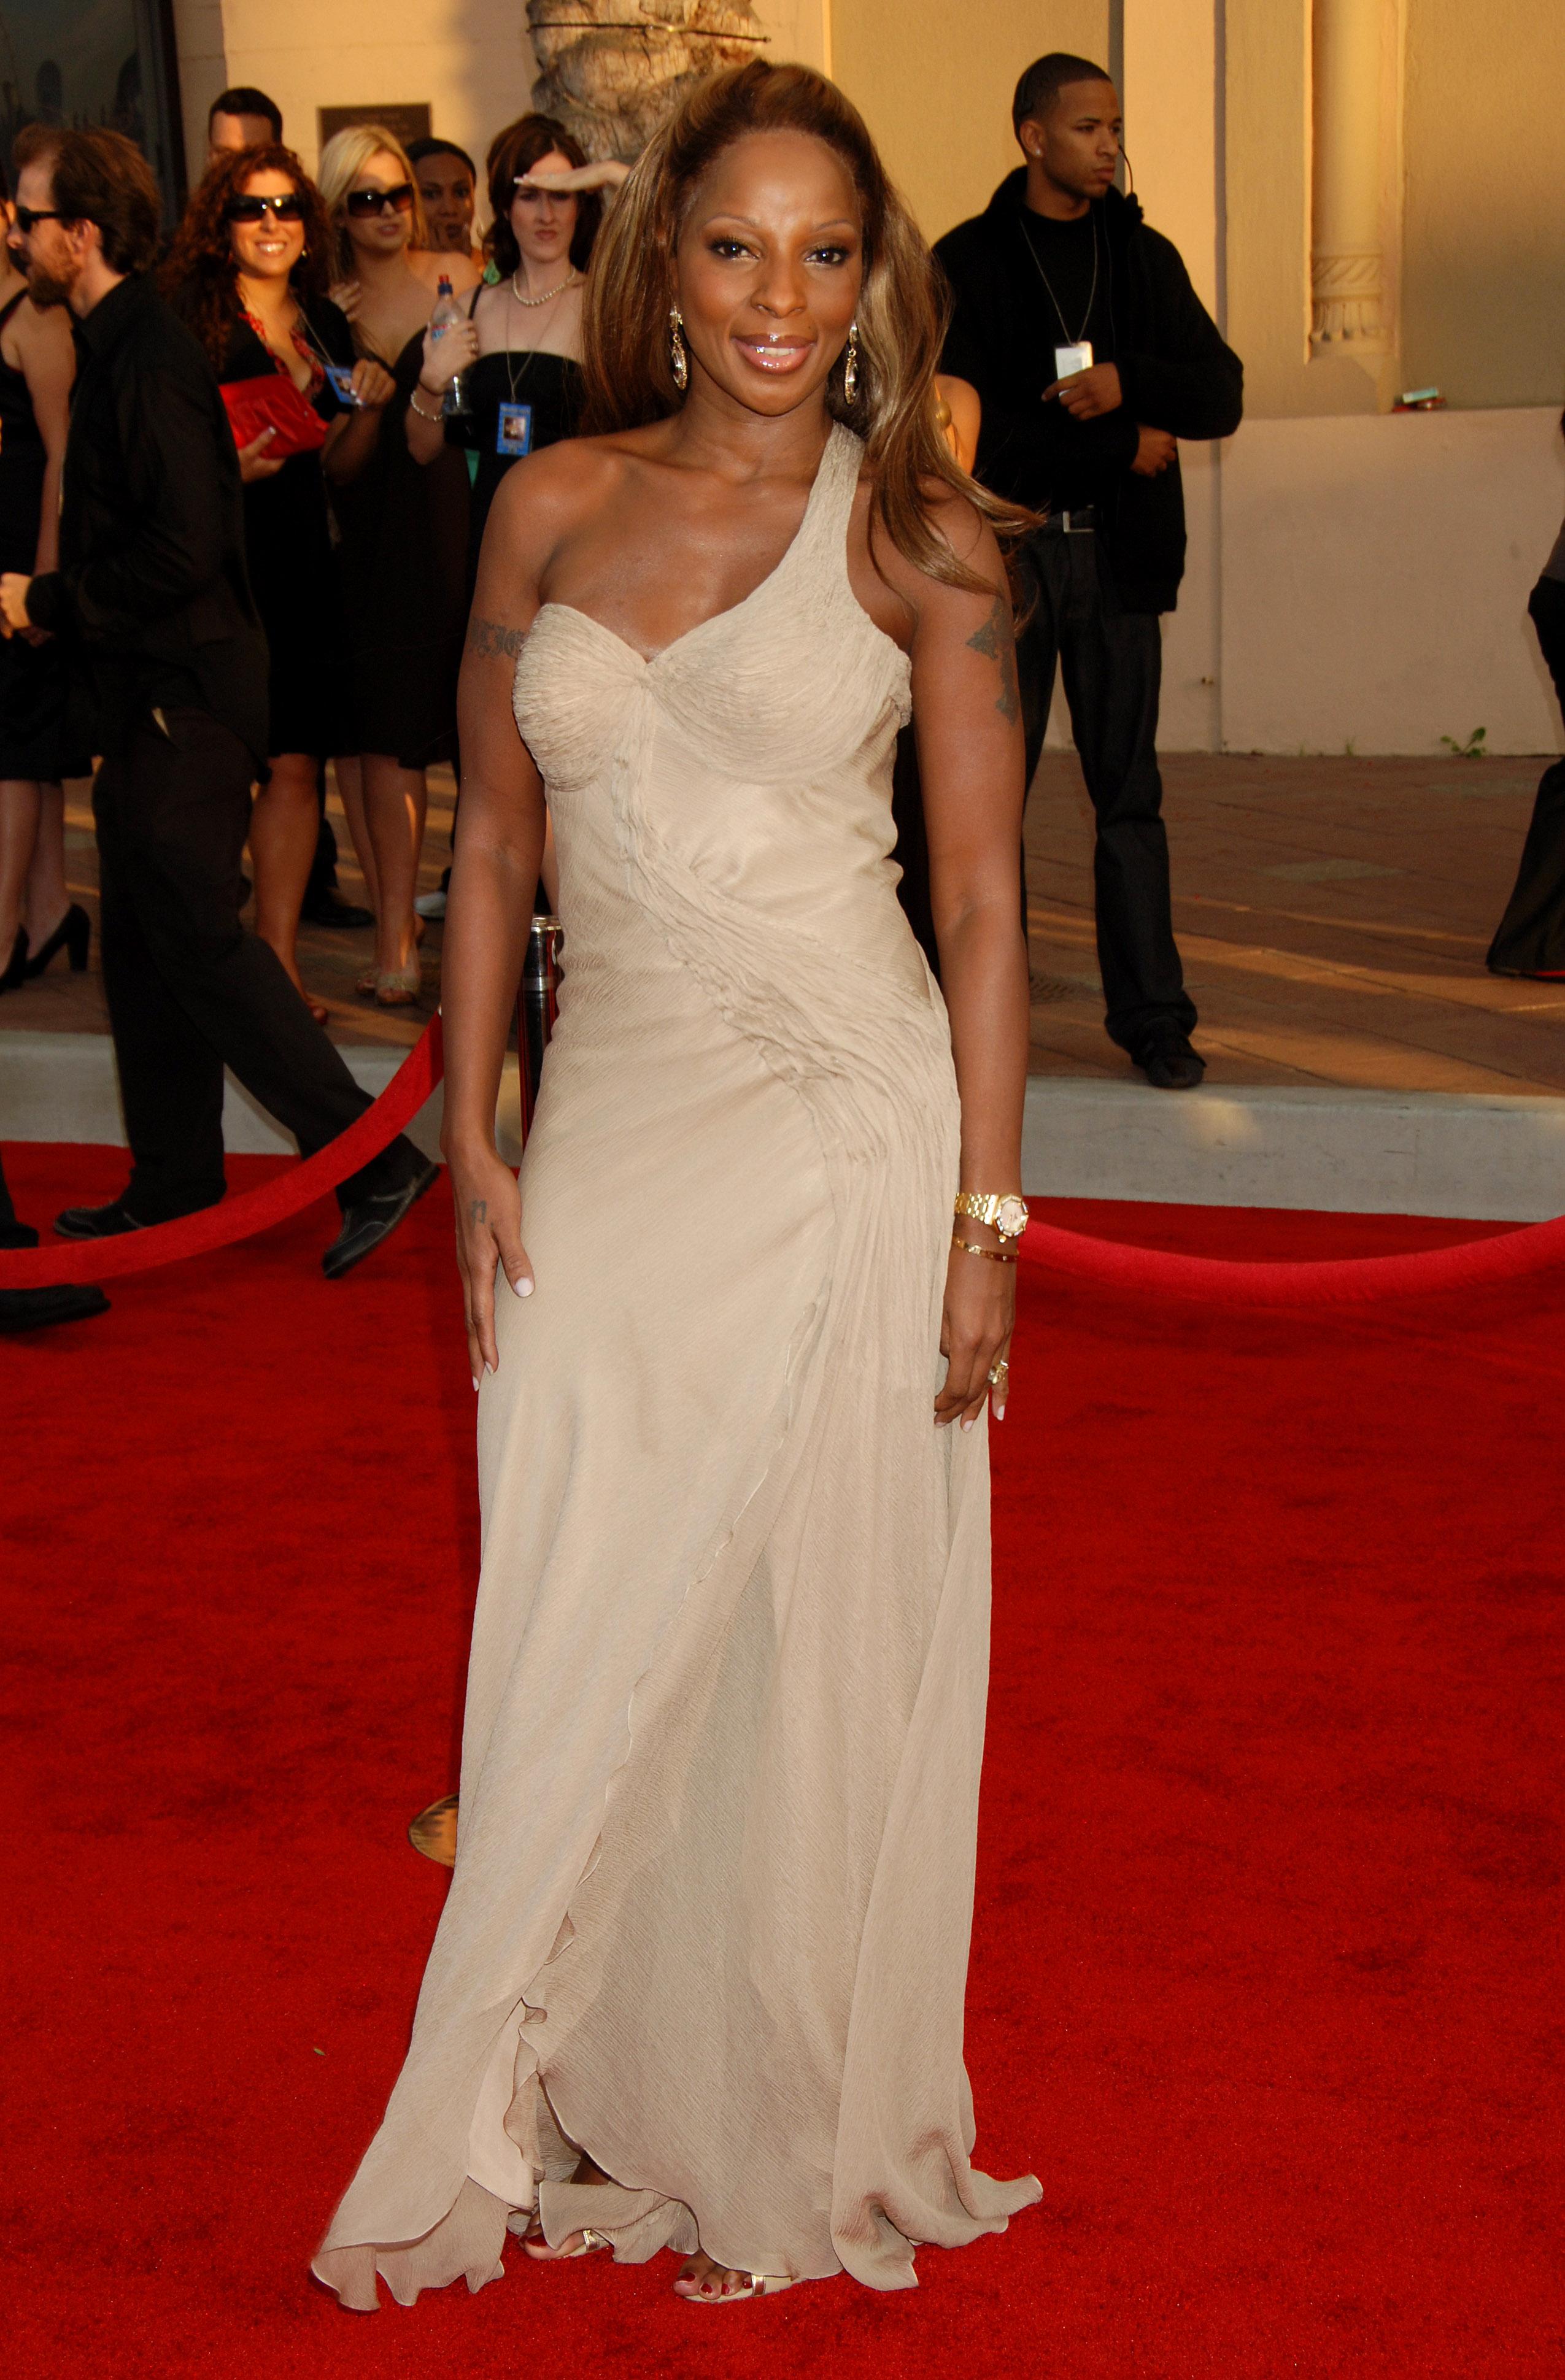 Jenna Dewan - IMDb